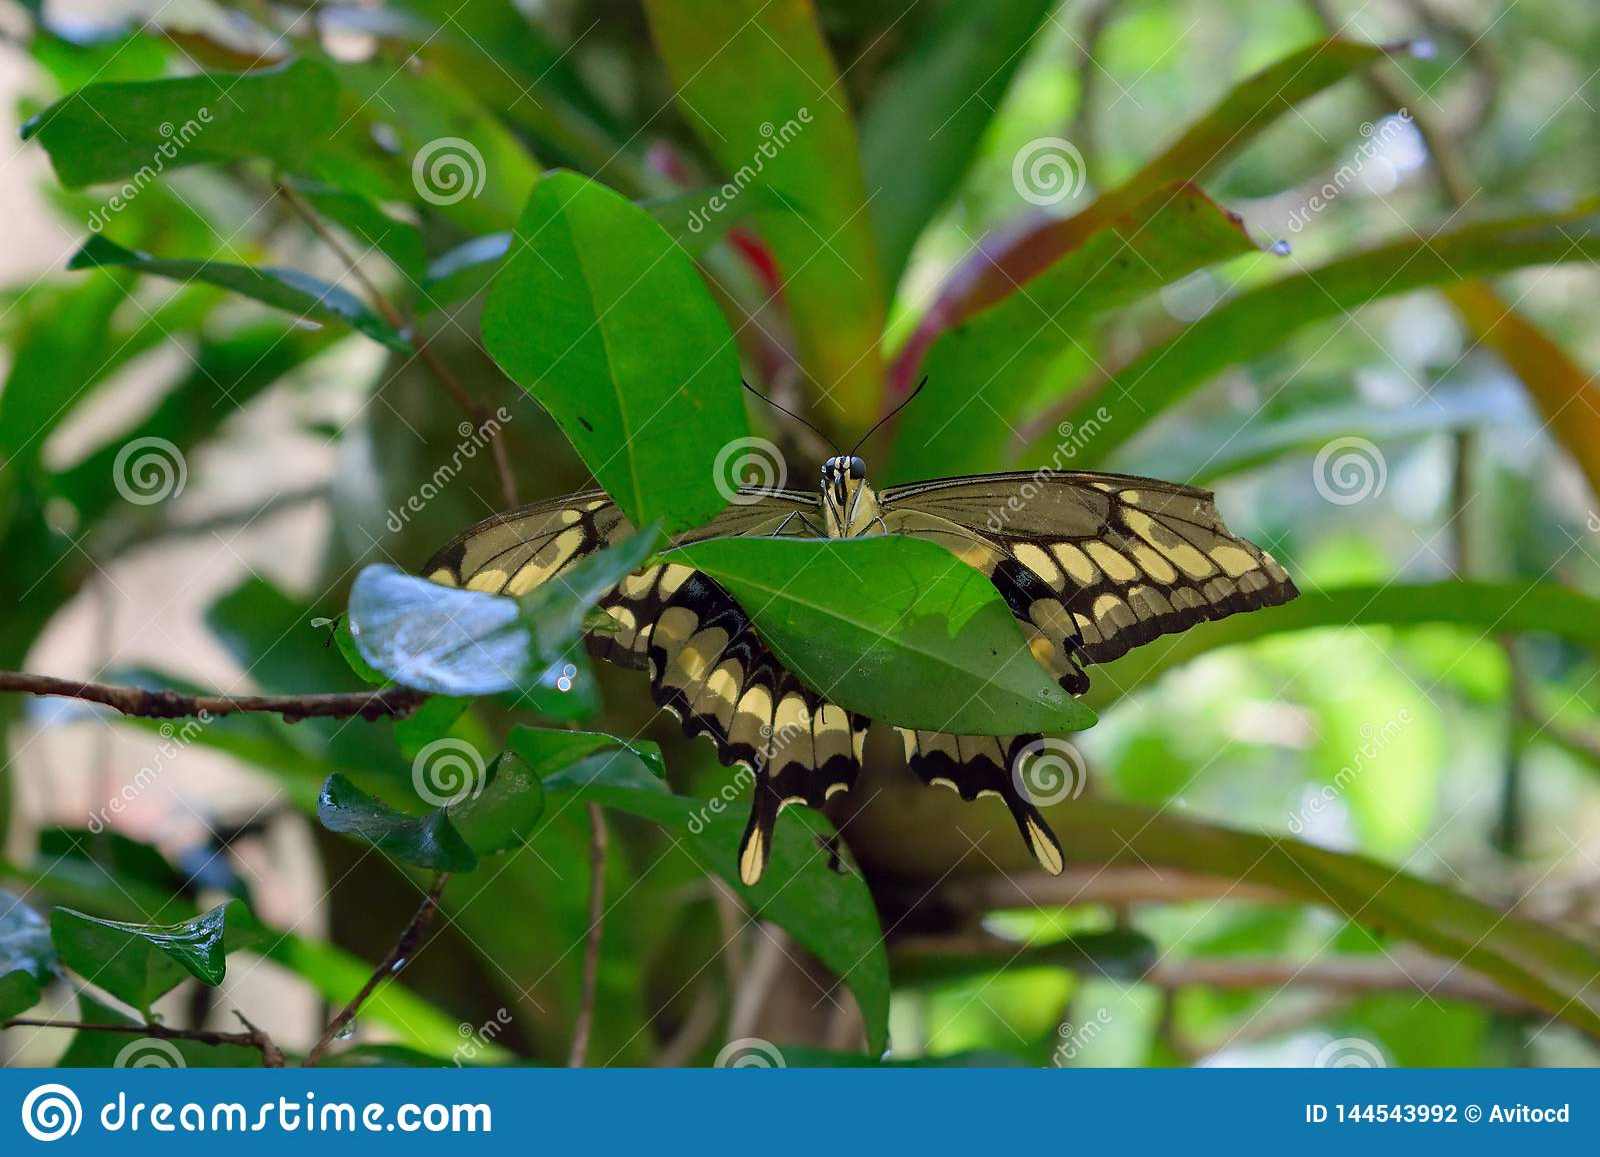 Buterrfly met open vleugels